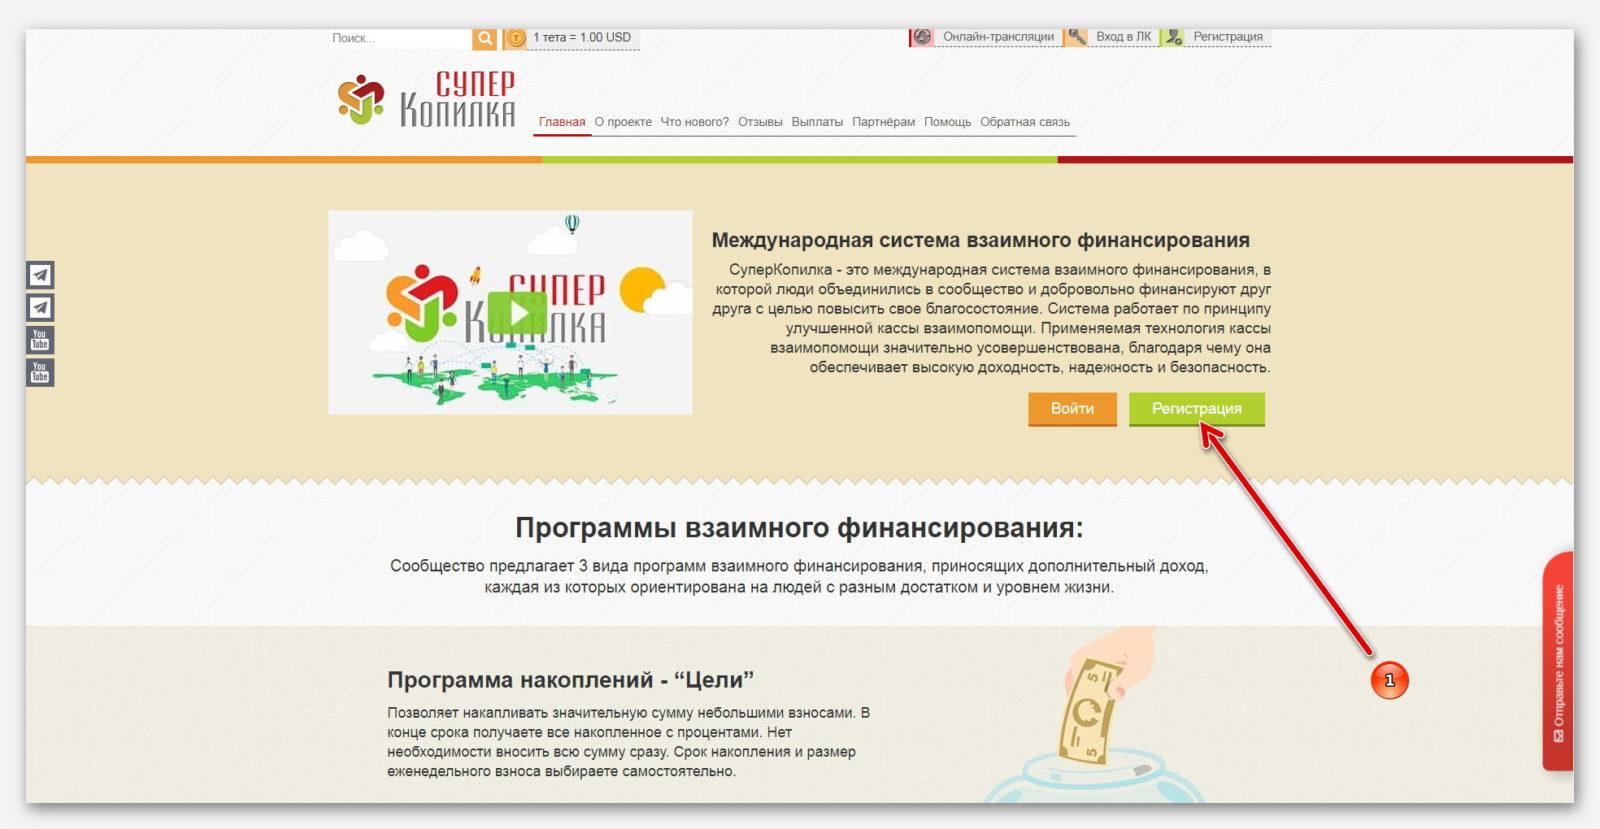 Регистрация в проекте СуперКопилка